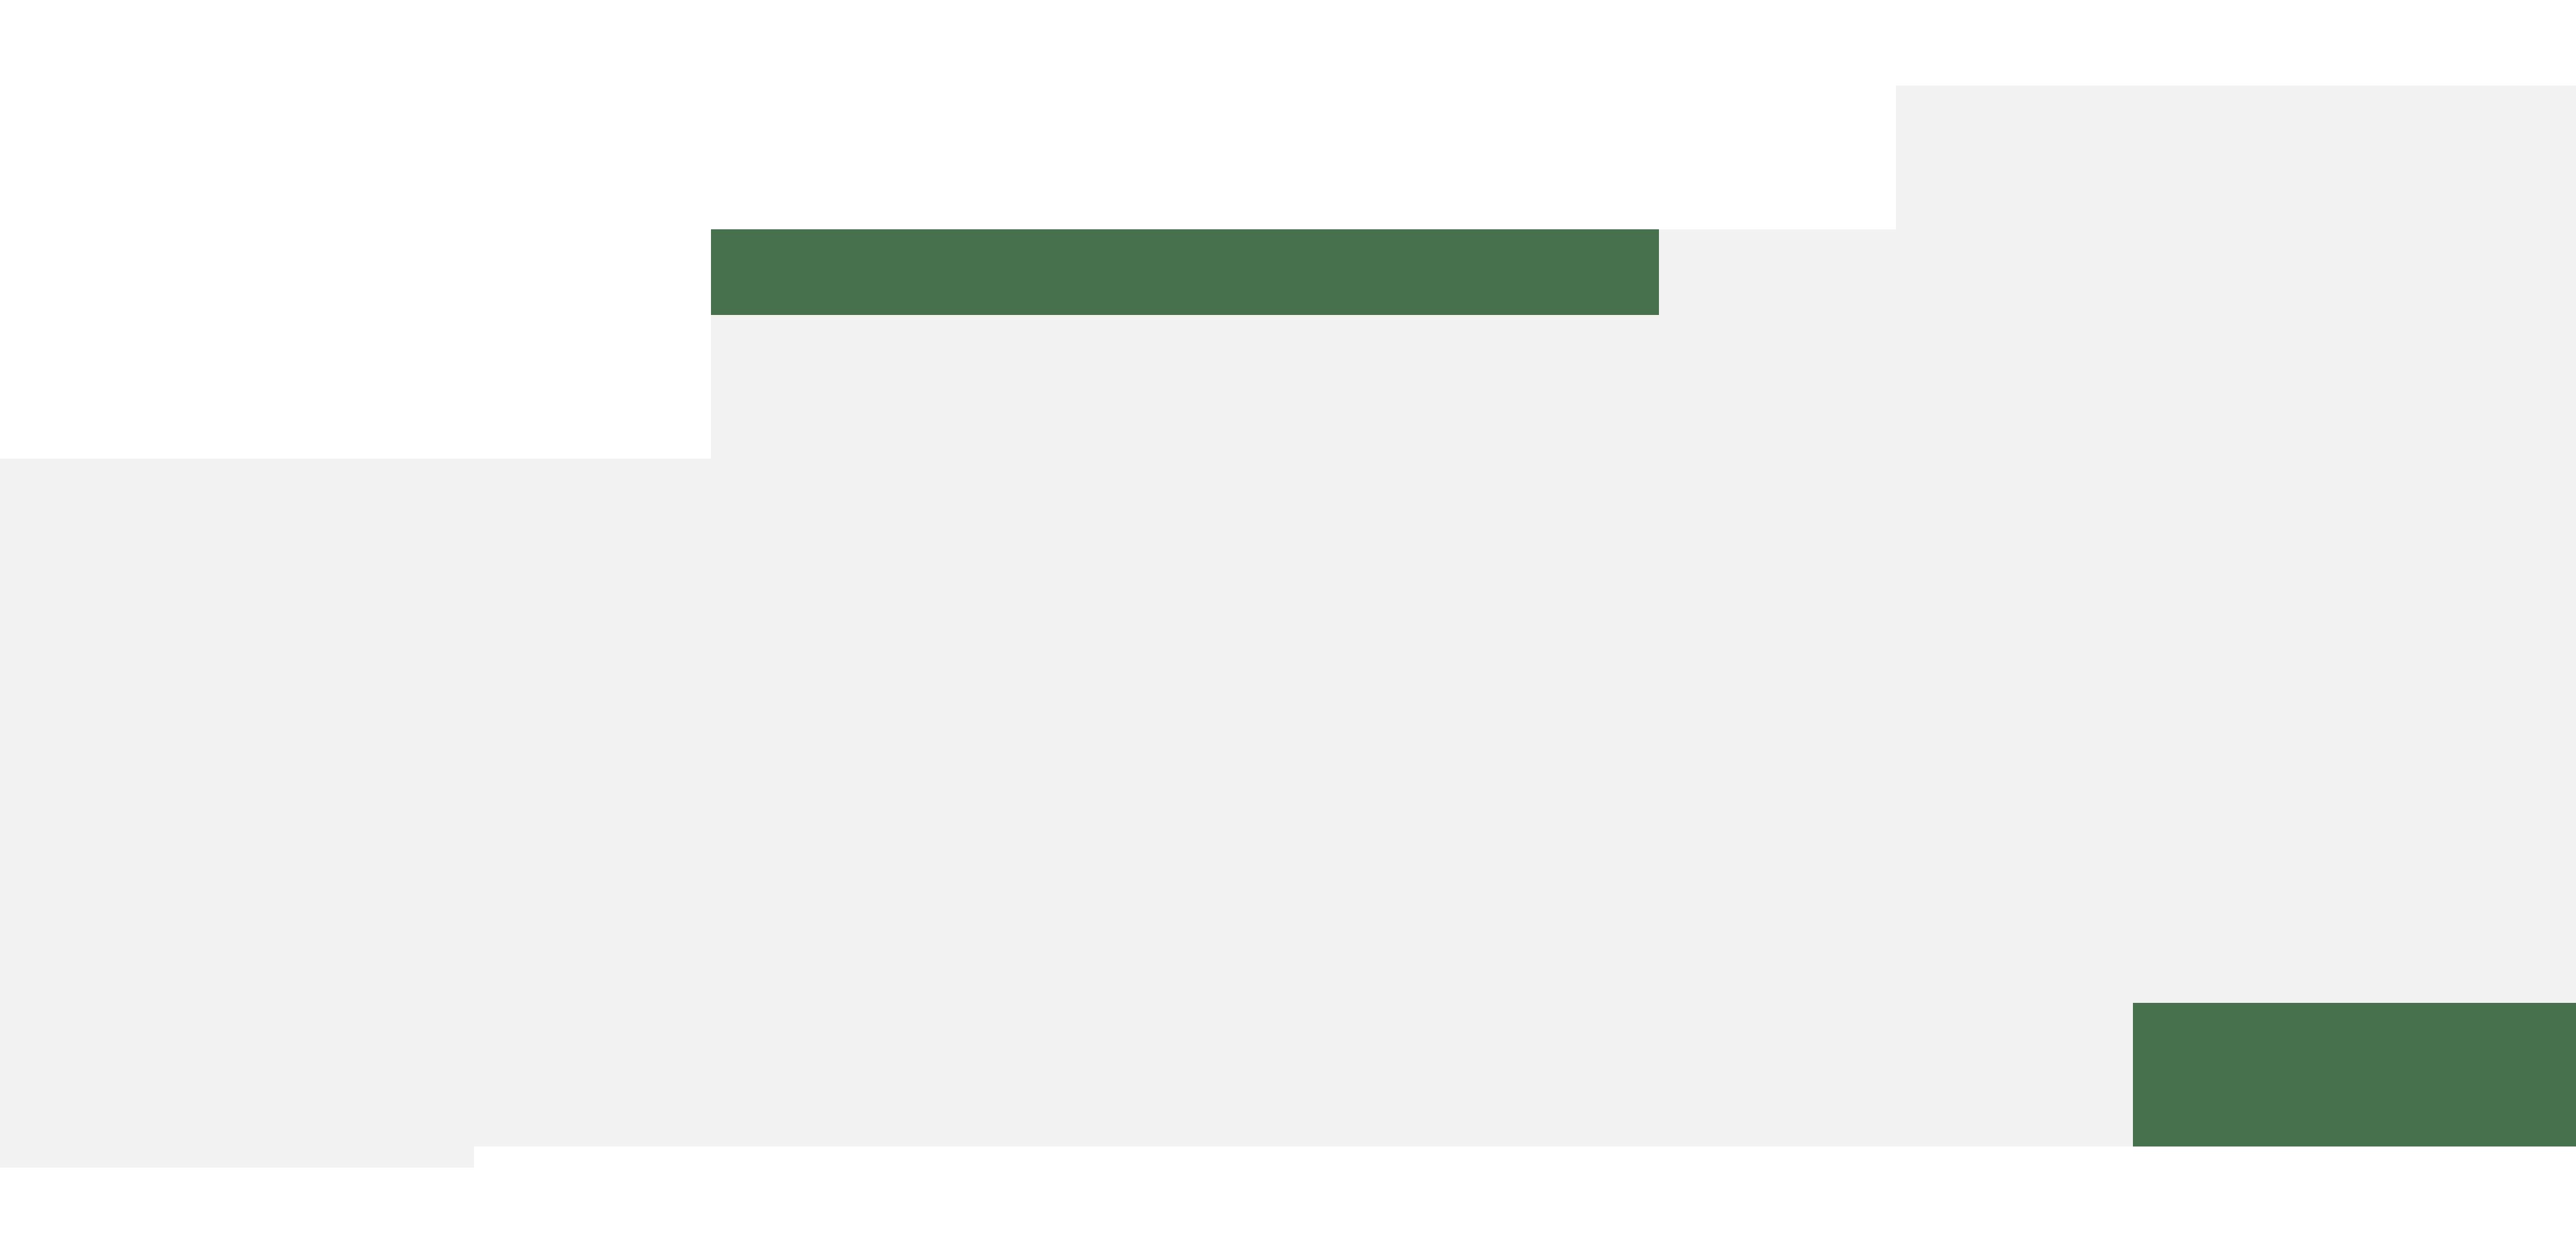 Purple line chart